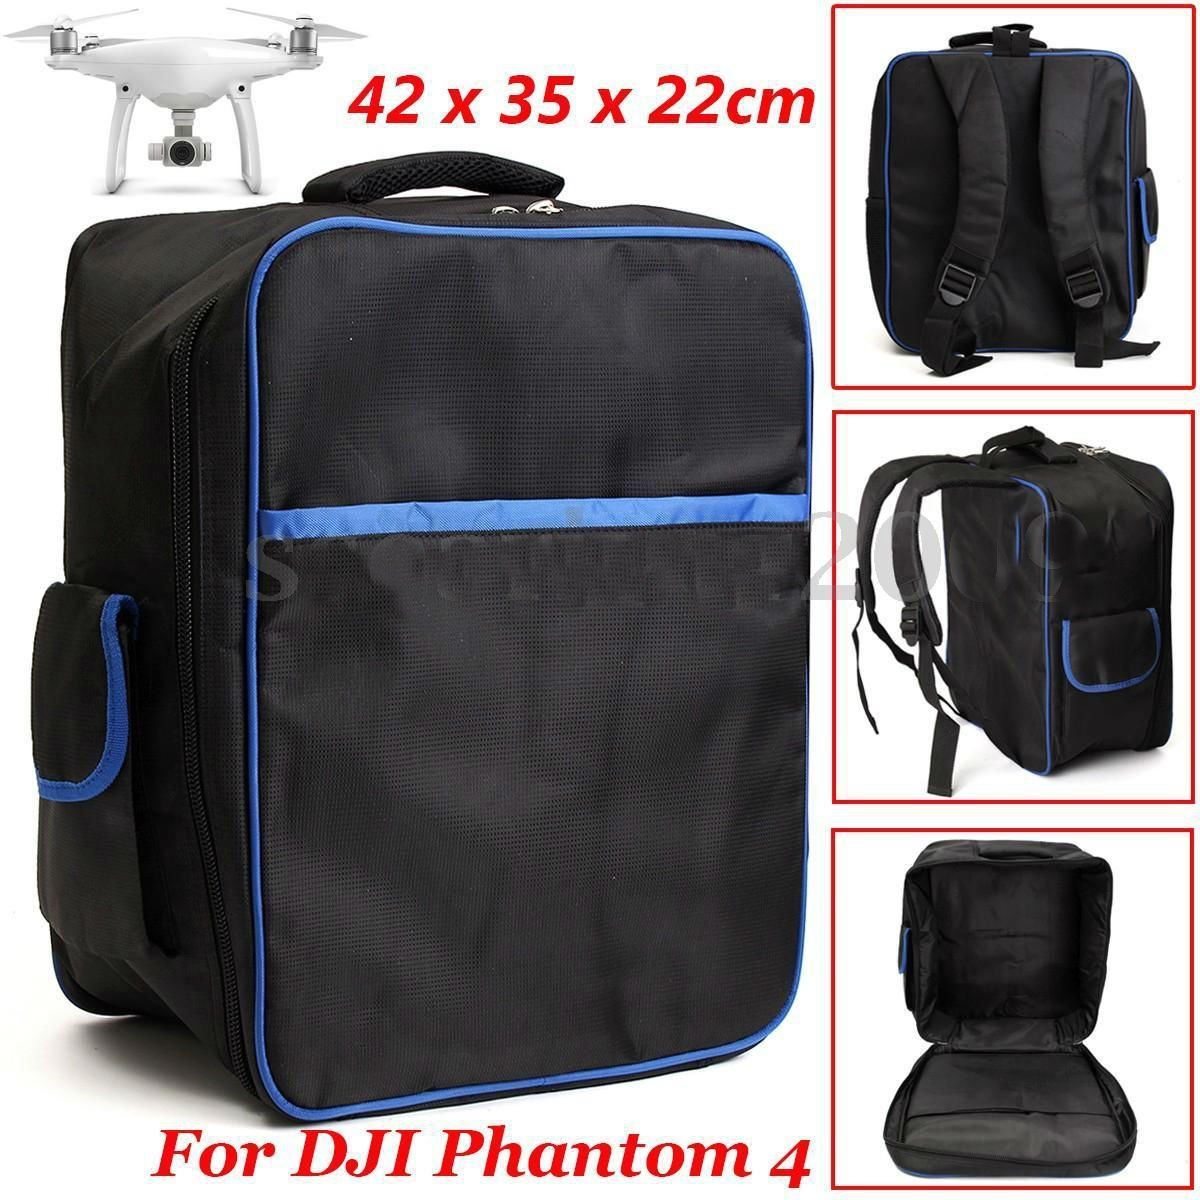 Waterproof Backpack Shoulder Bag Carrying Case For DJI Phantom 3 4 Quadcopter ddb